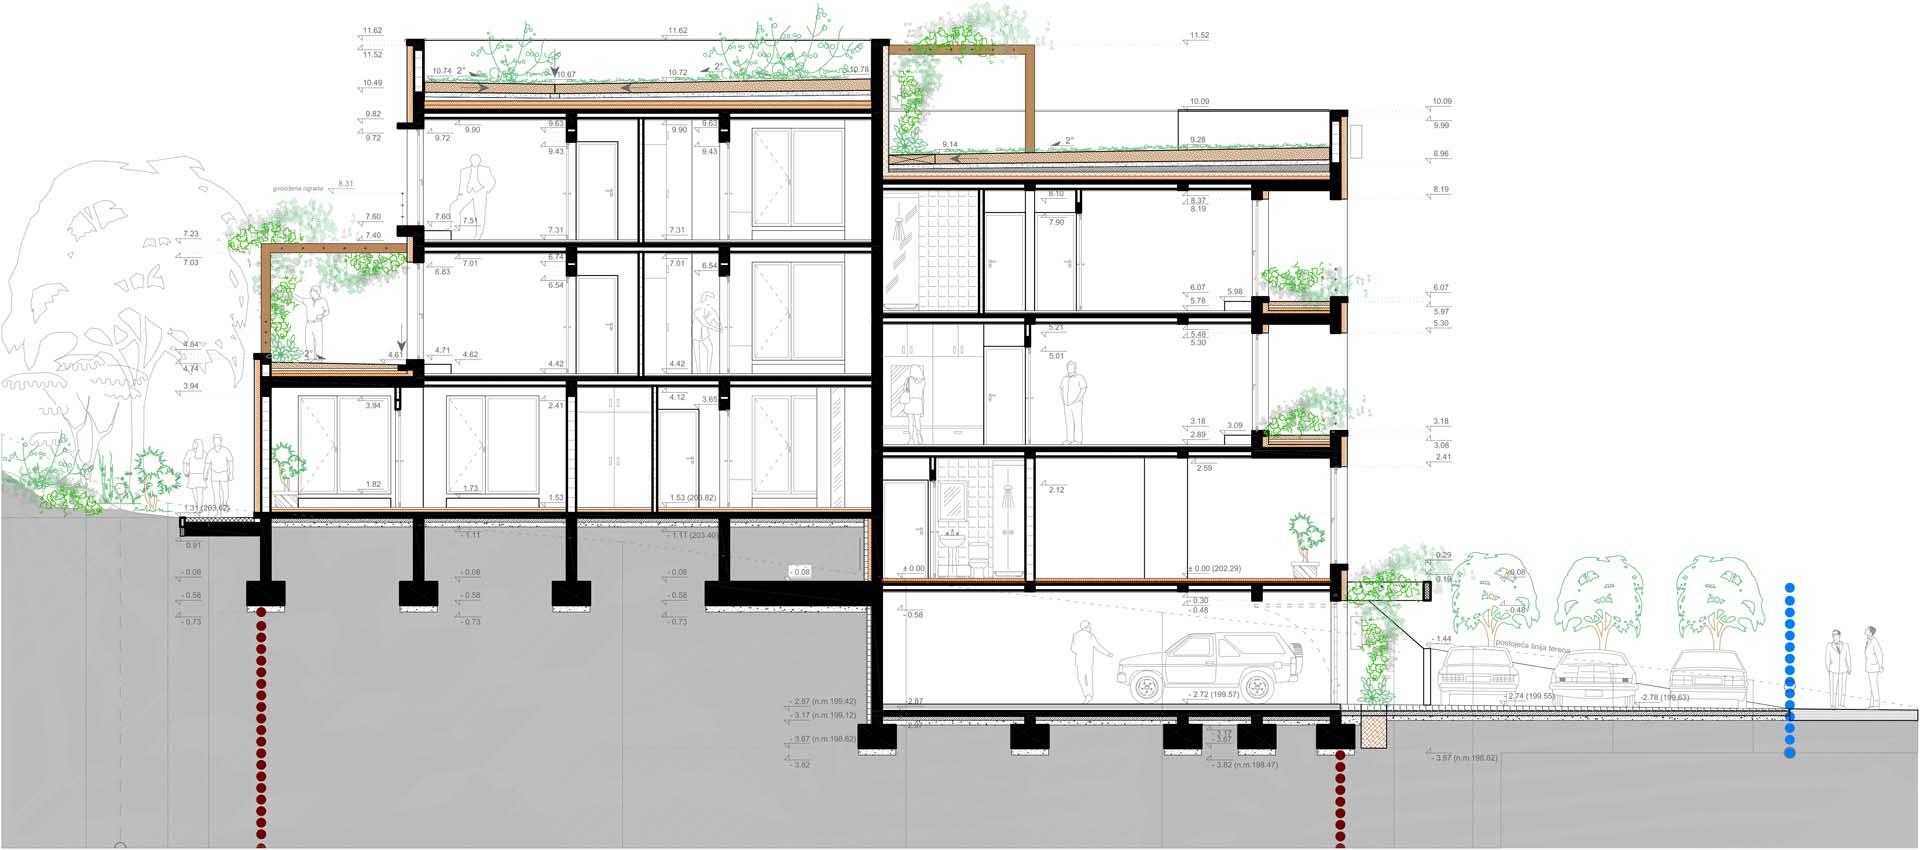 RESIDENTIAL BUILDING SOLARIS RESIDENT